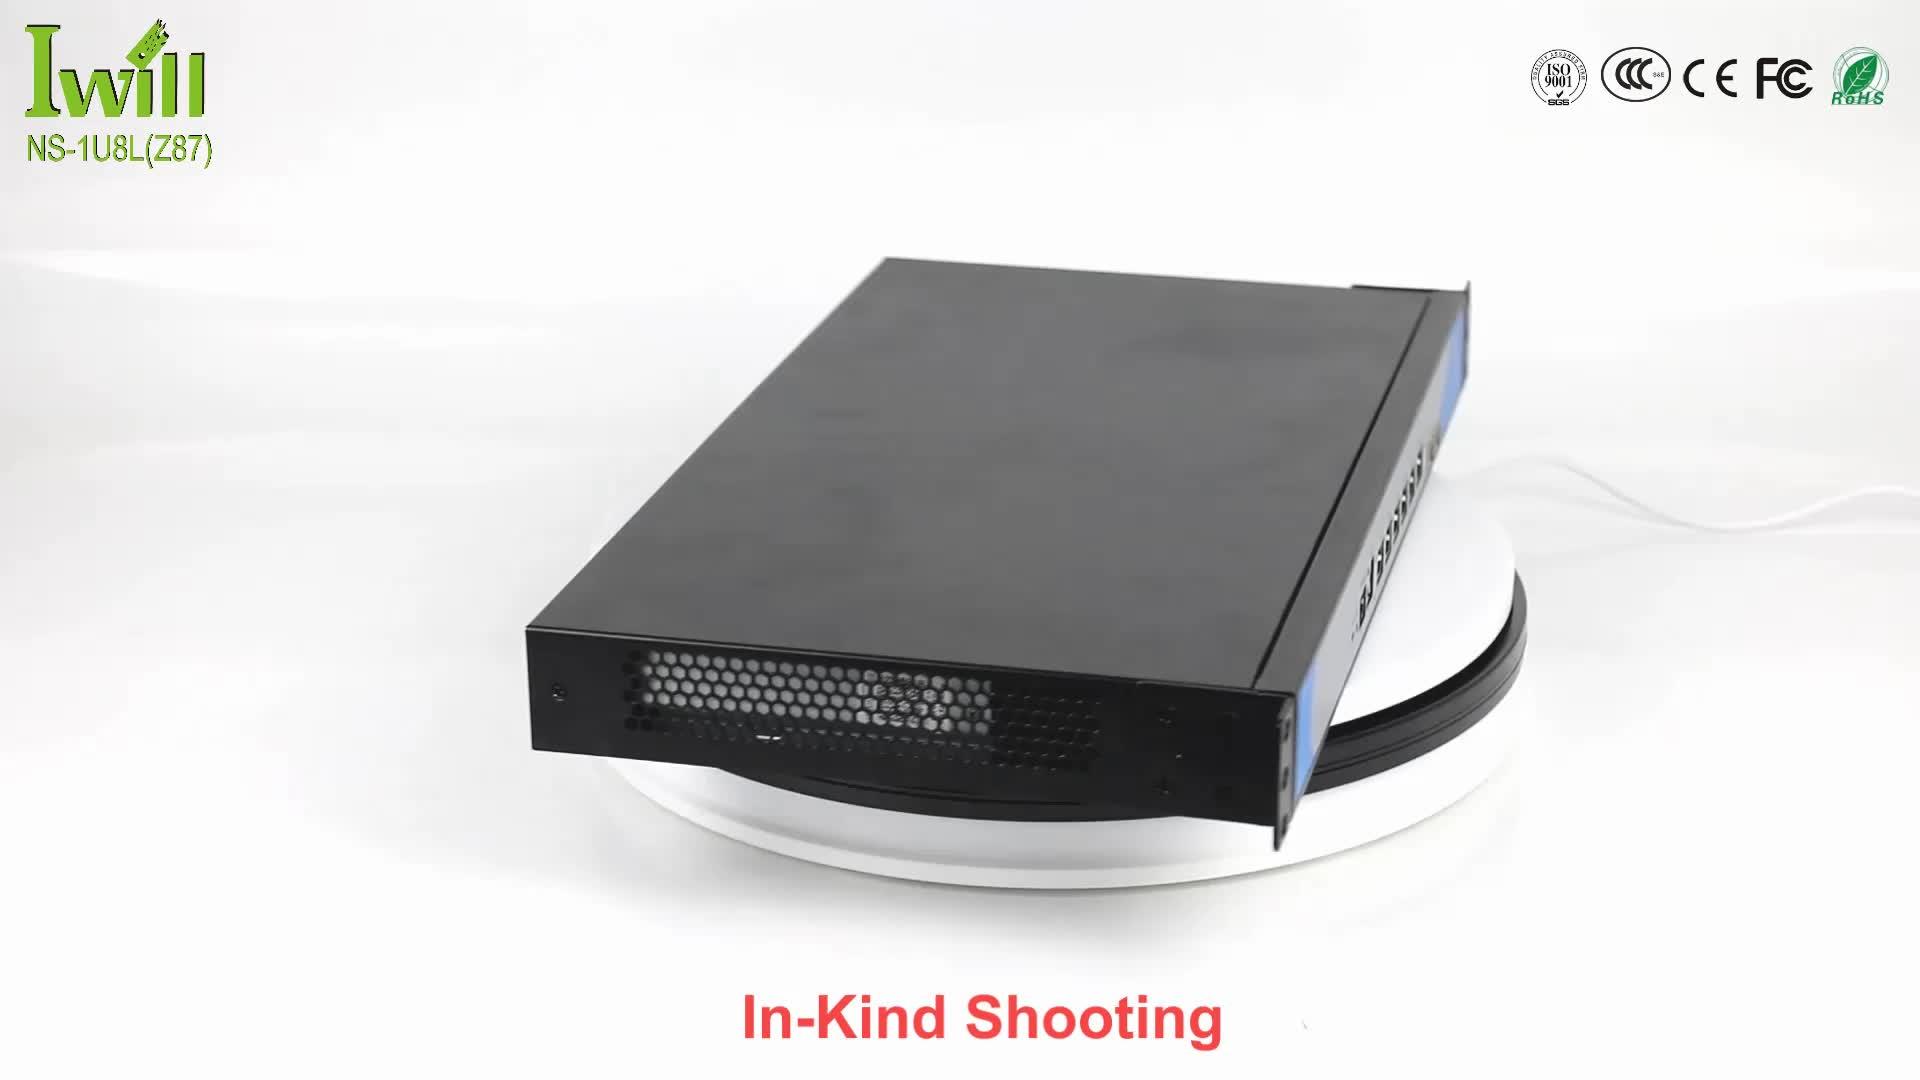 19 Inch 1U rack server Intel i3/i5/i7 Dual core 6 LAN pfsence router with 2 fibre optical port option